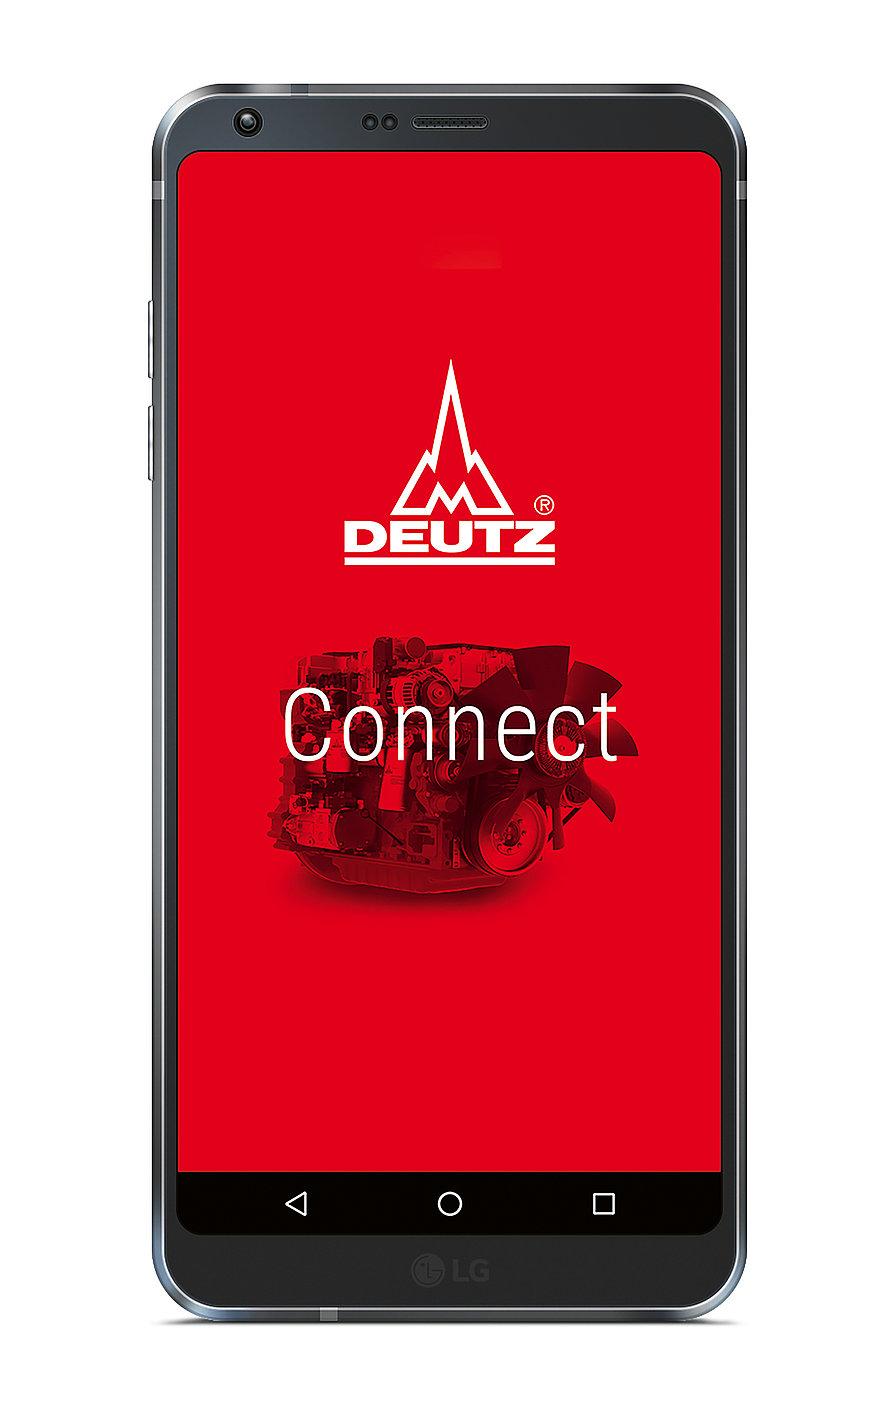 DEUTZ Connect | Red Dot Design Award